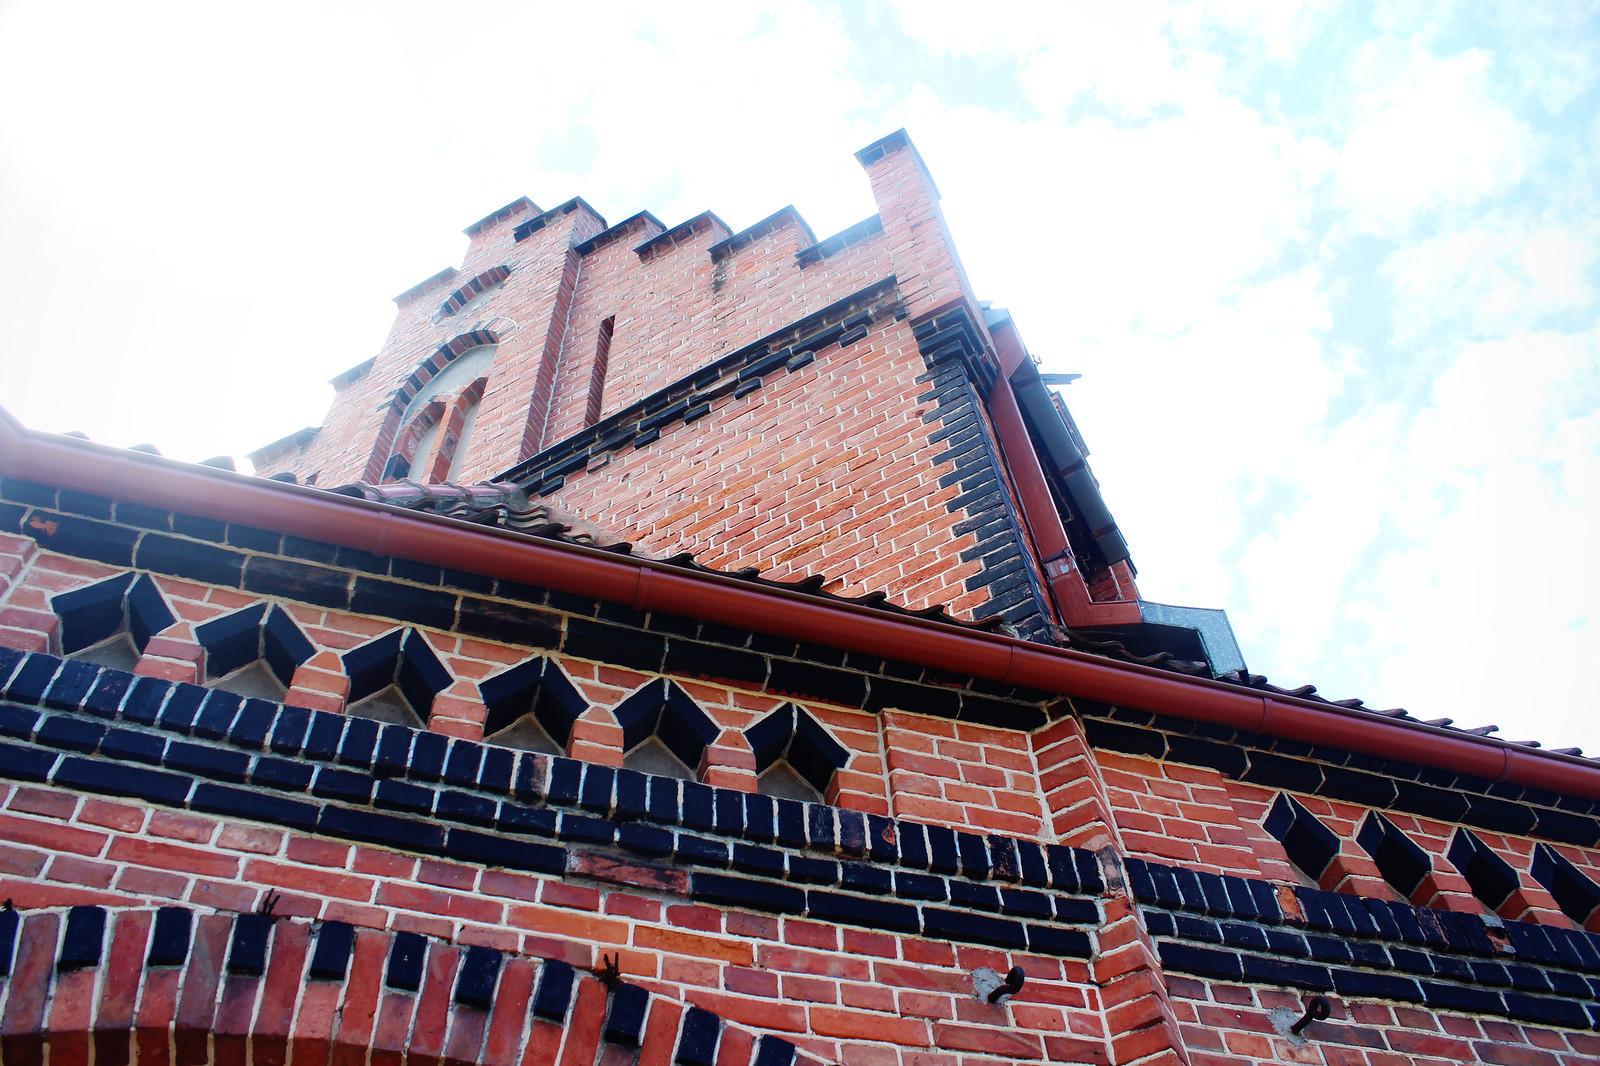 Jaunmoku castle